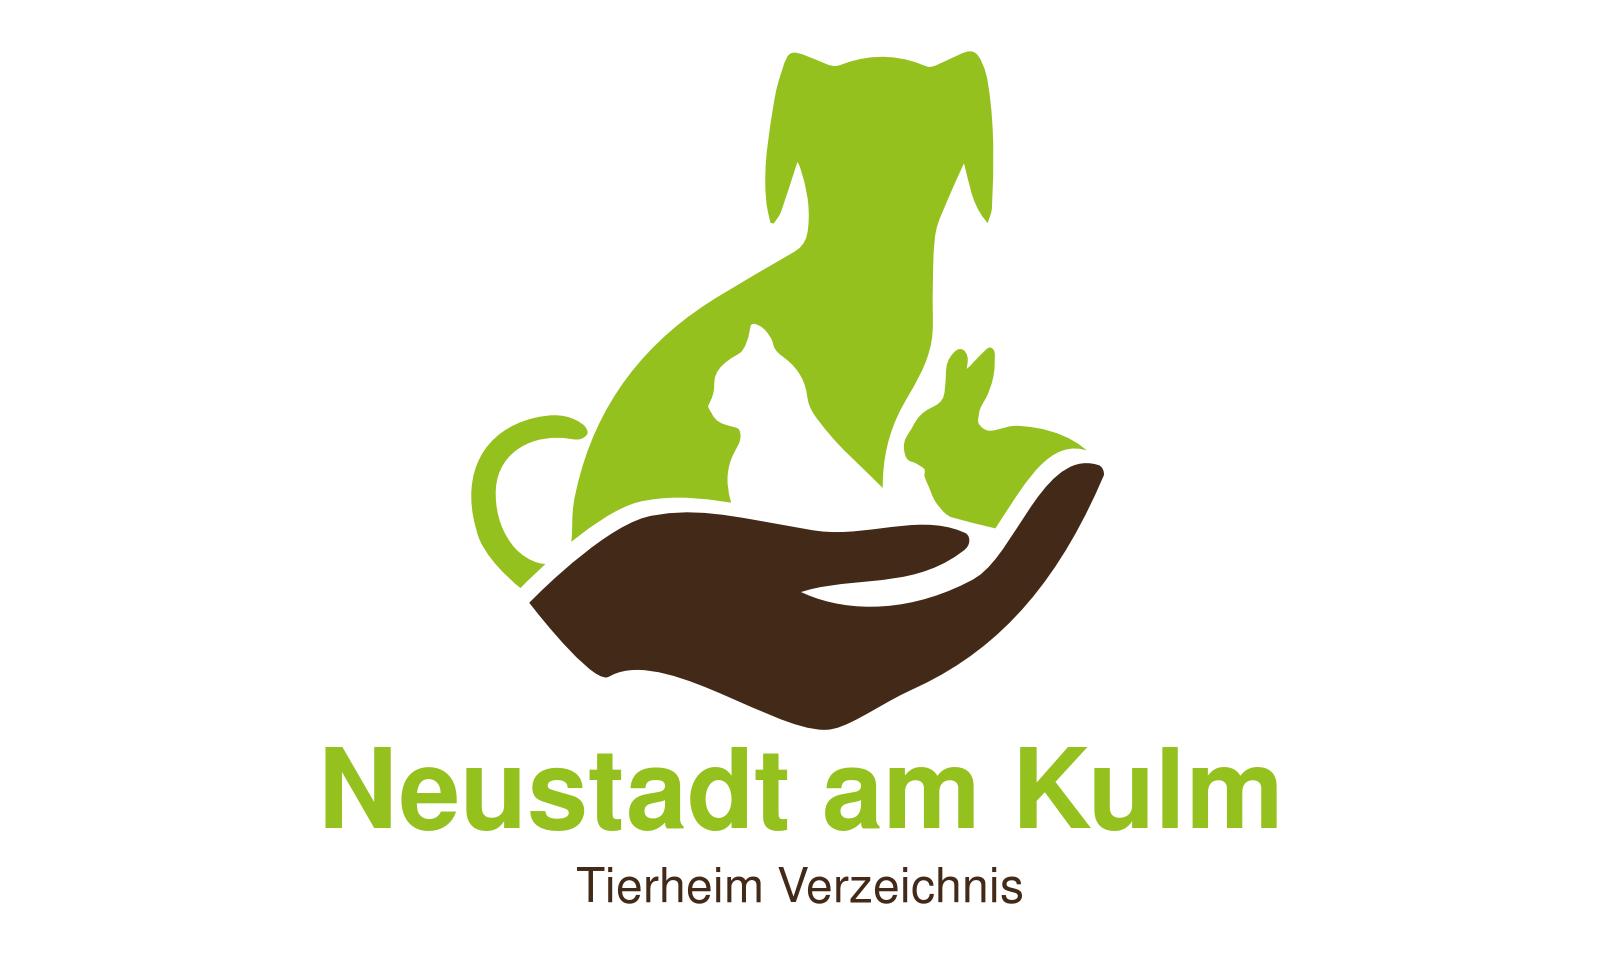 Tierheim Neustadt am Kulm